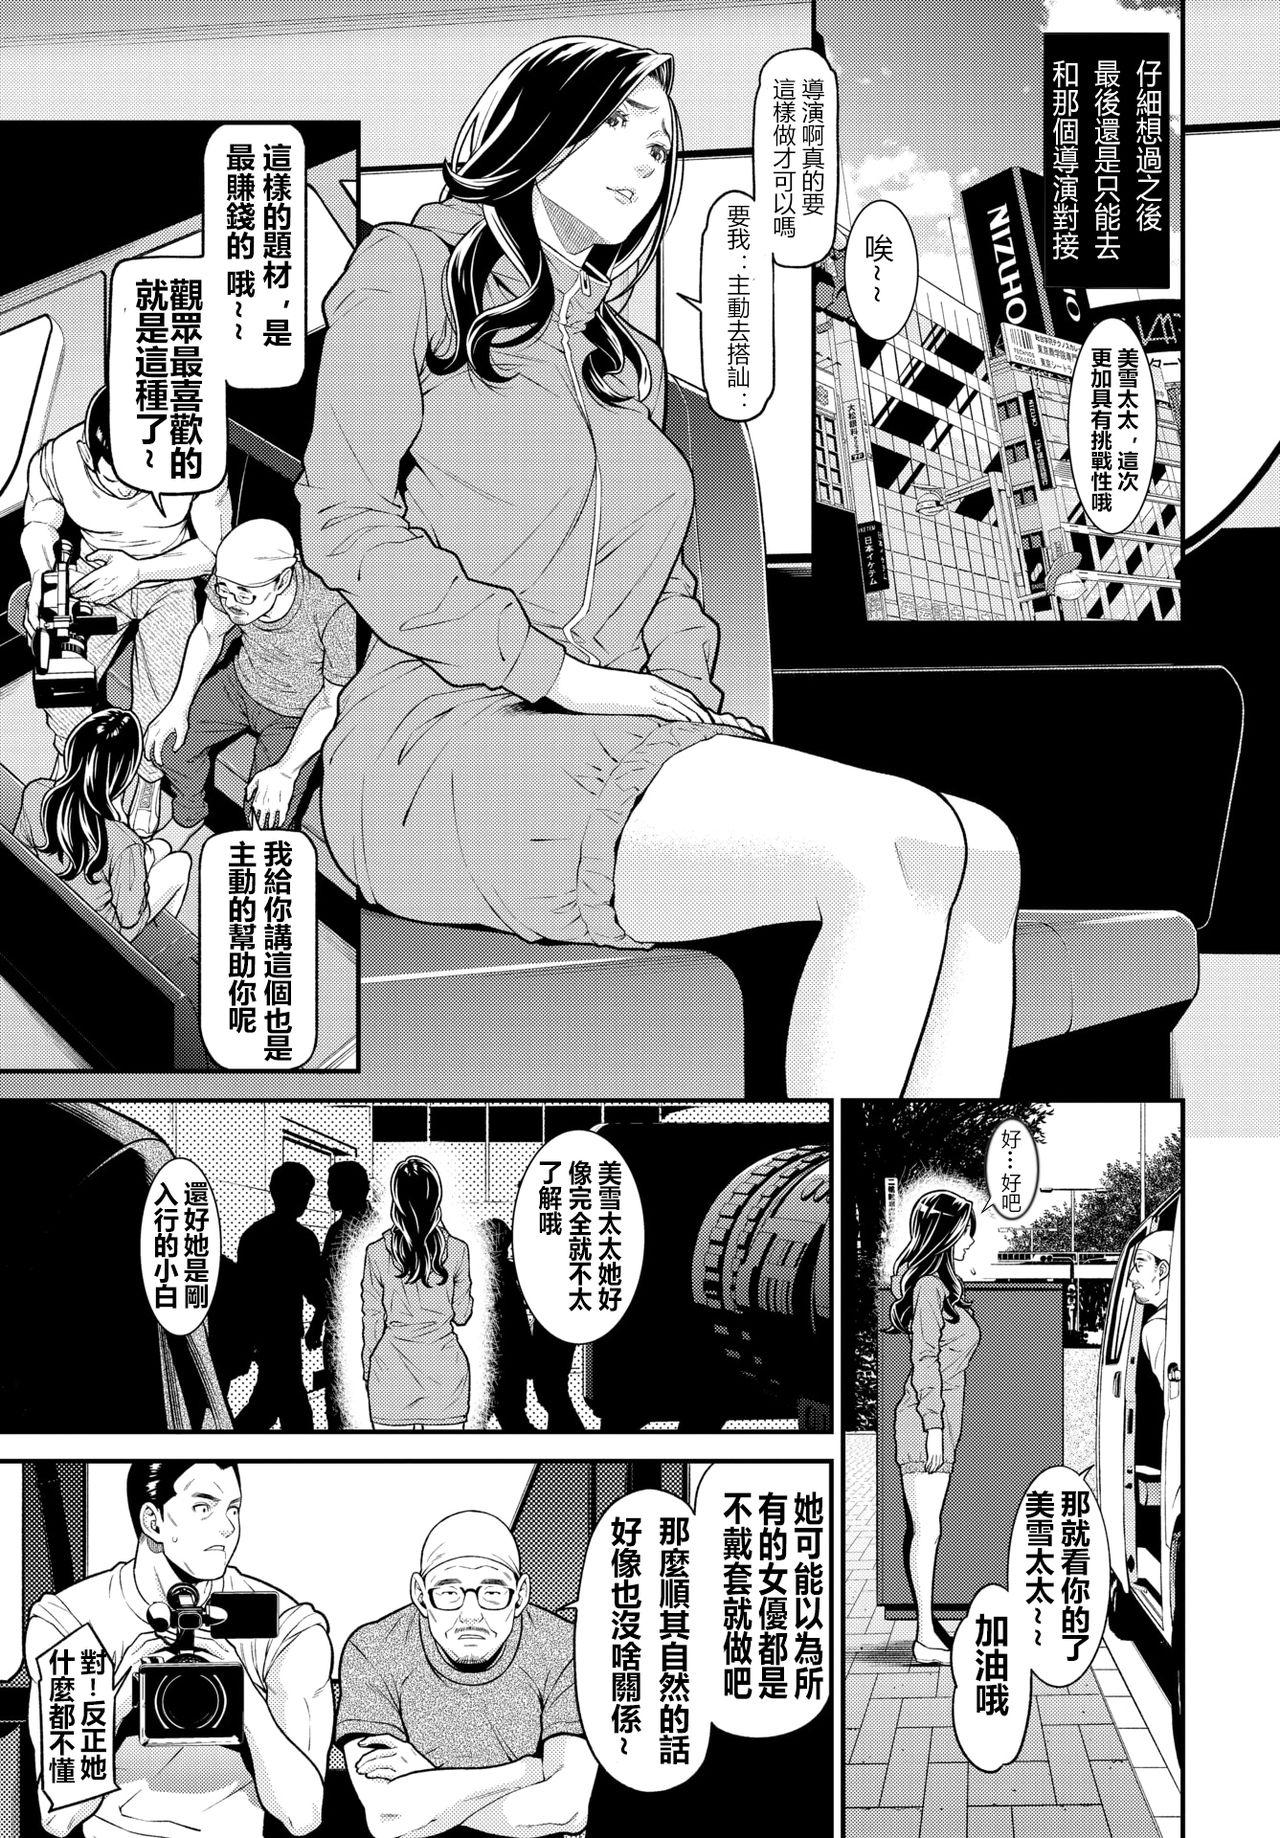 [Syuuen] Secret Wife  1-6 [Chinese][鼠灣漢化](210206最新修复完整版)【極品人妻NTR】 23